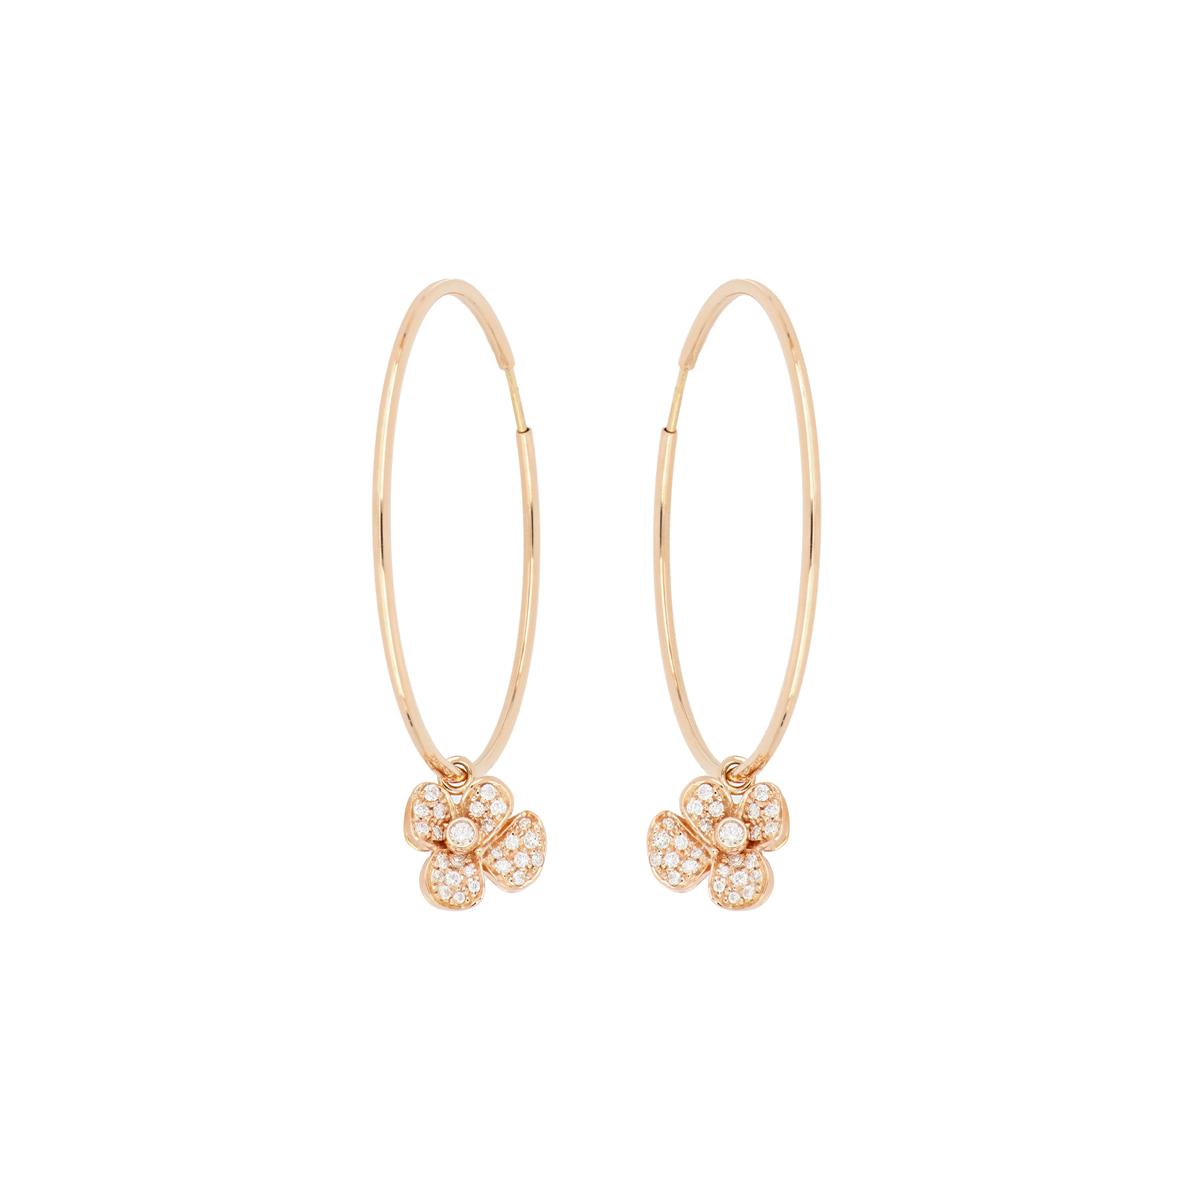 Red Gold Hoop Earrings with Diamond Flower Dangle